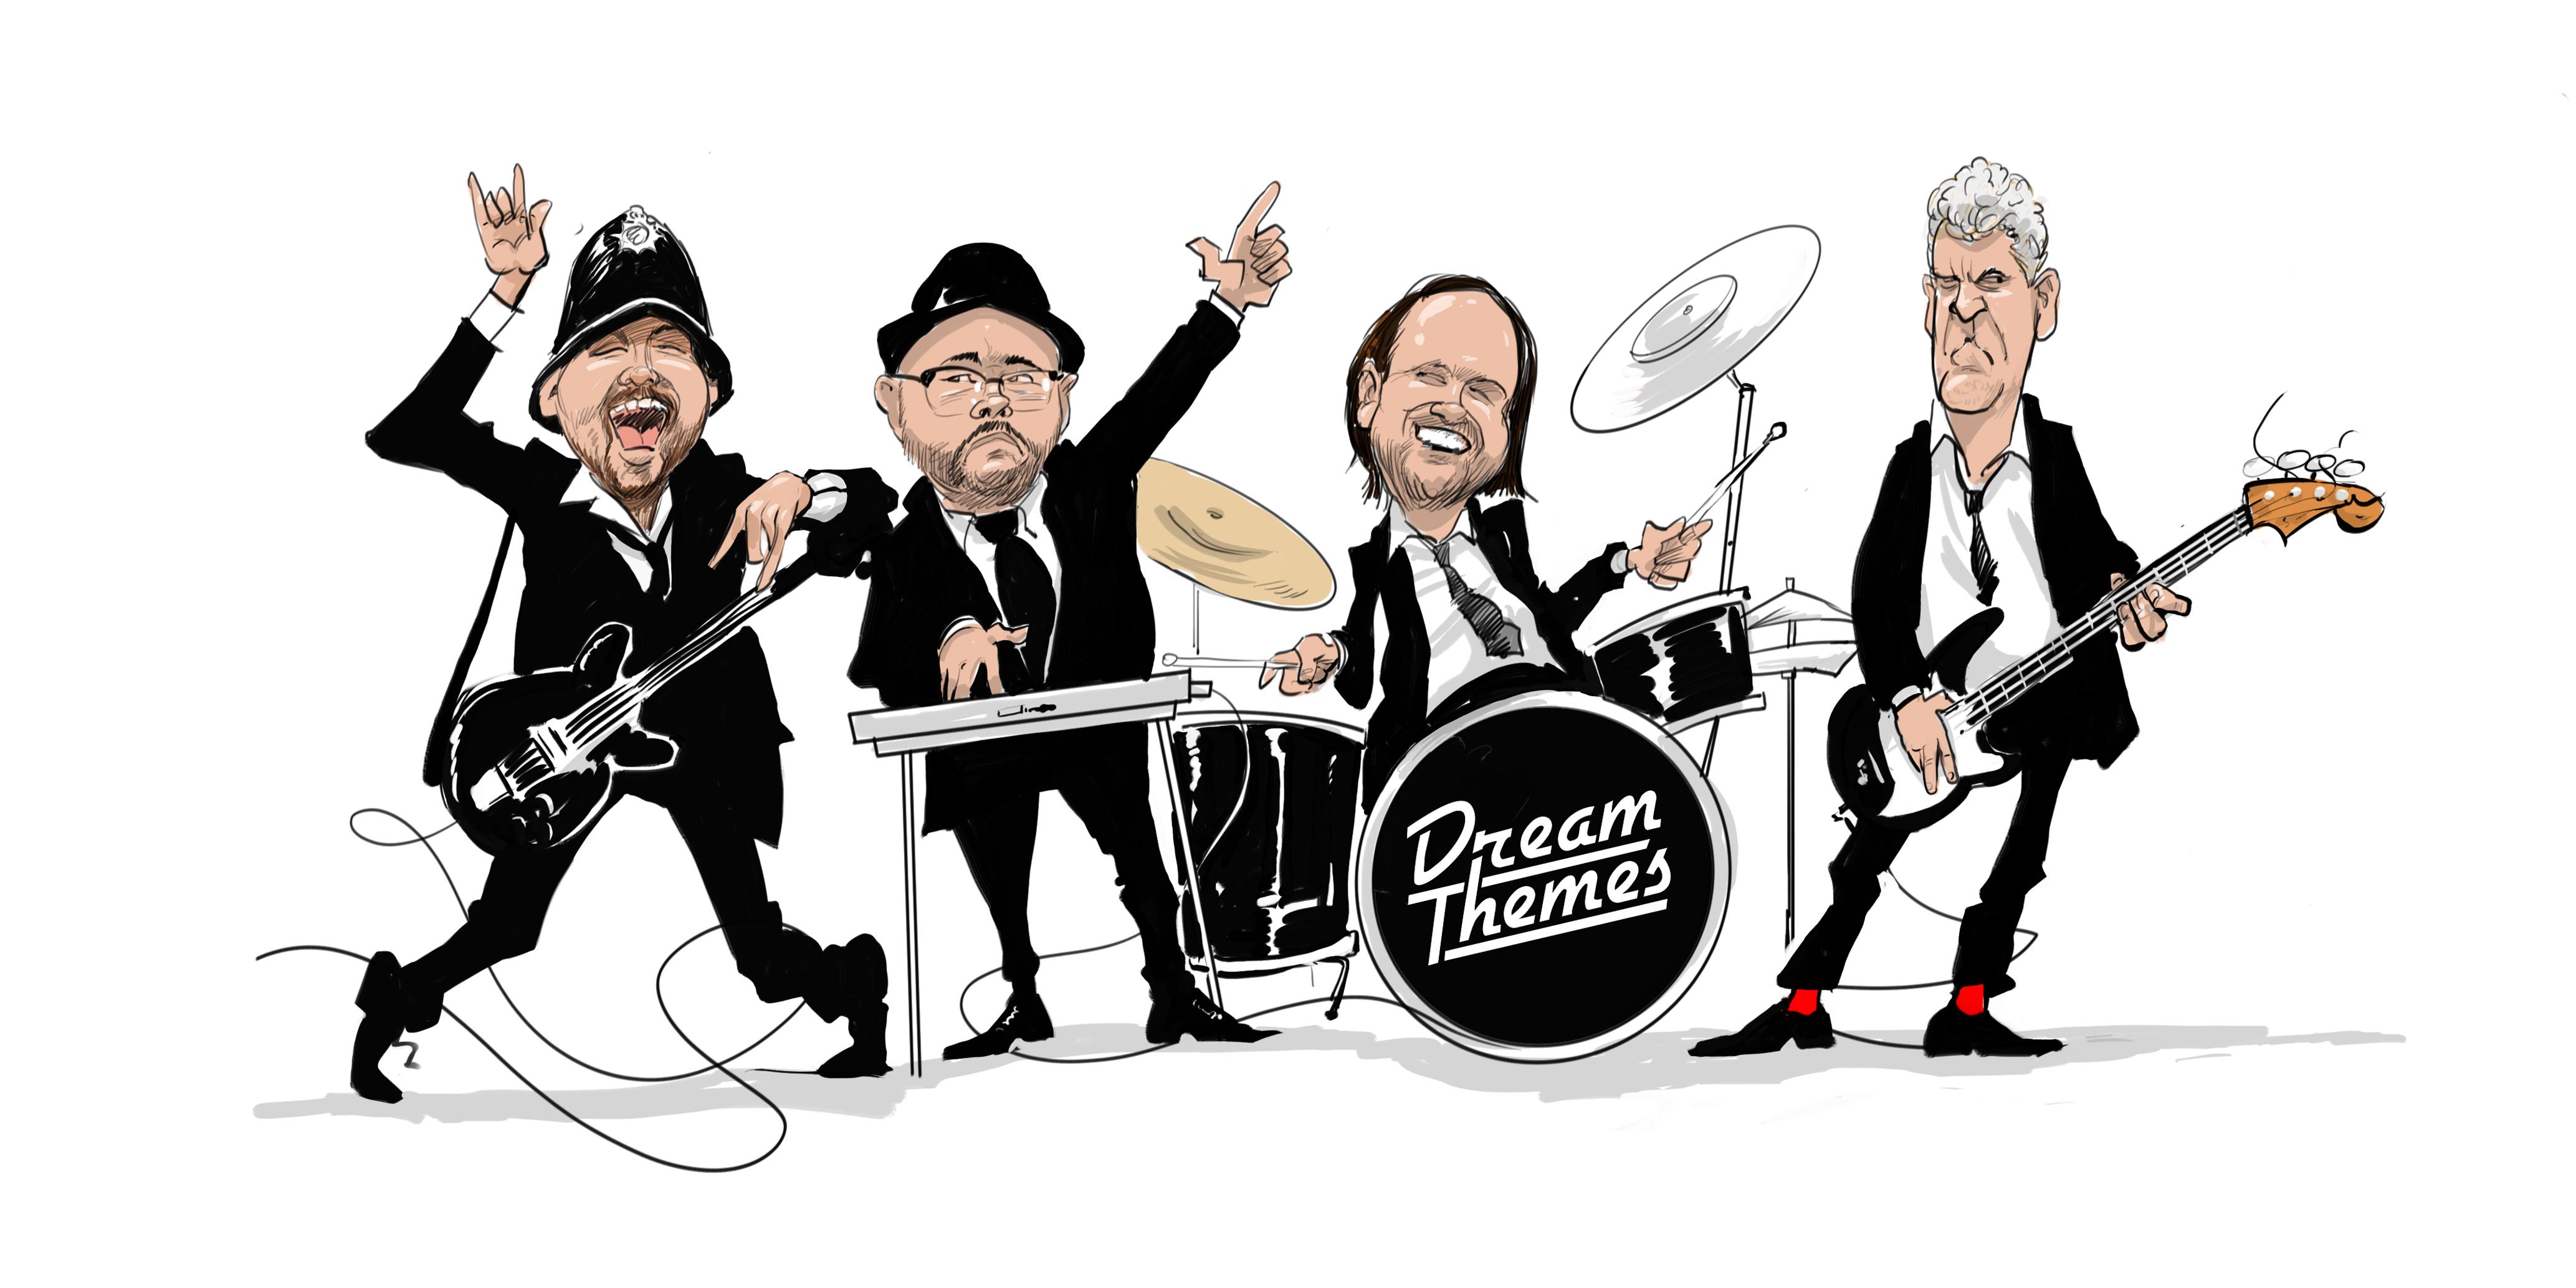 dt-caricature